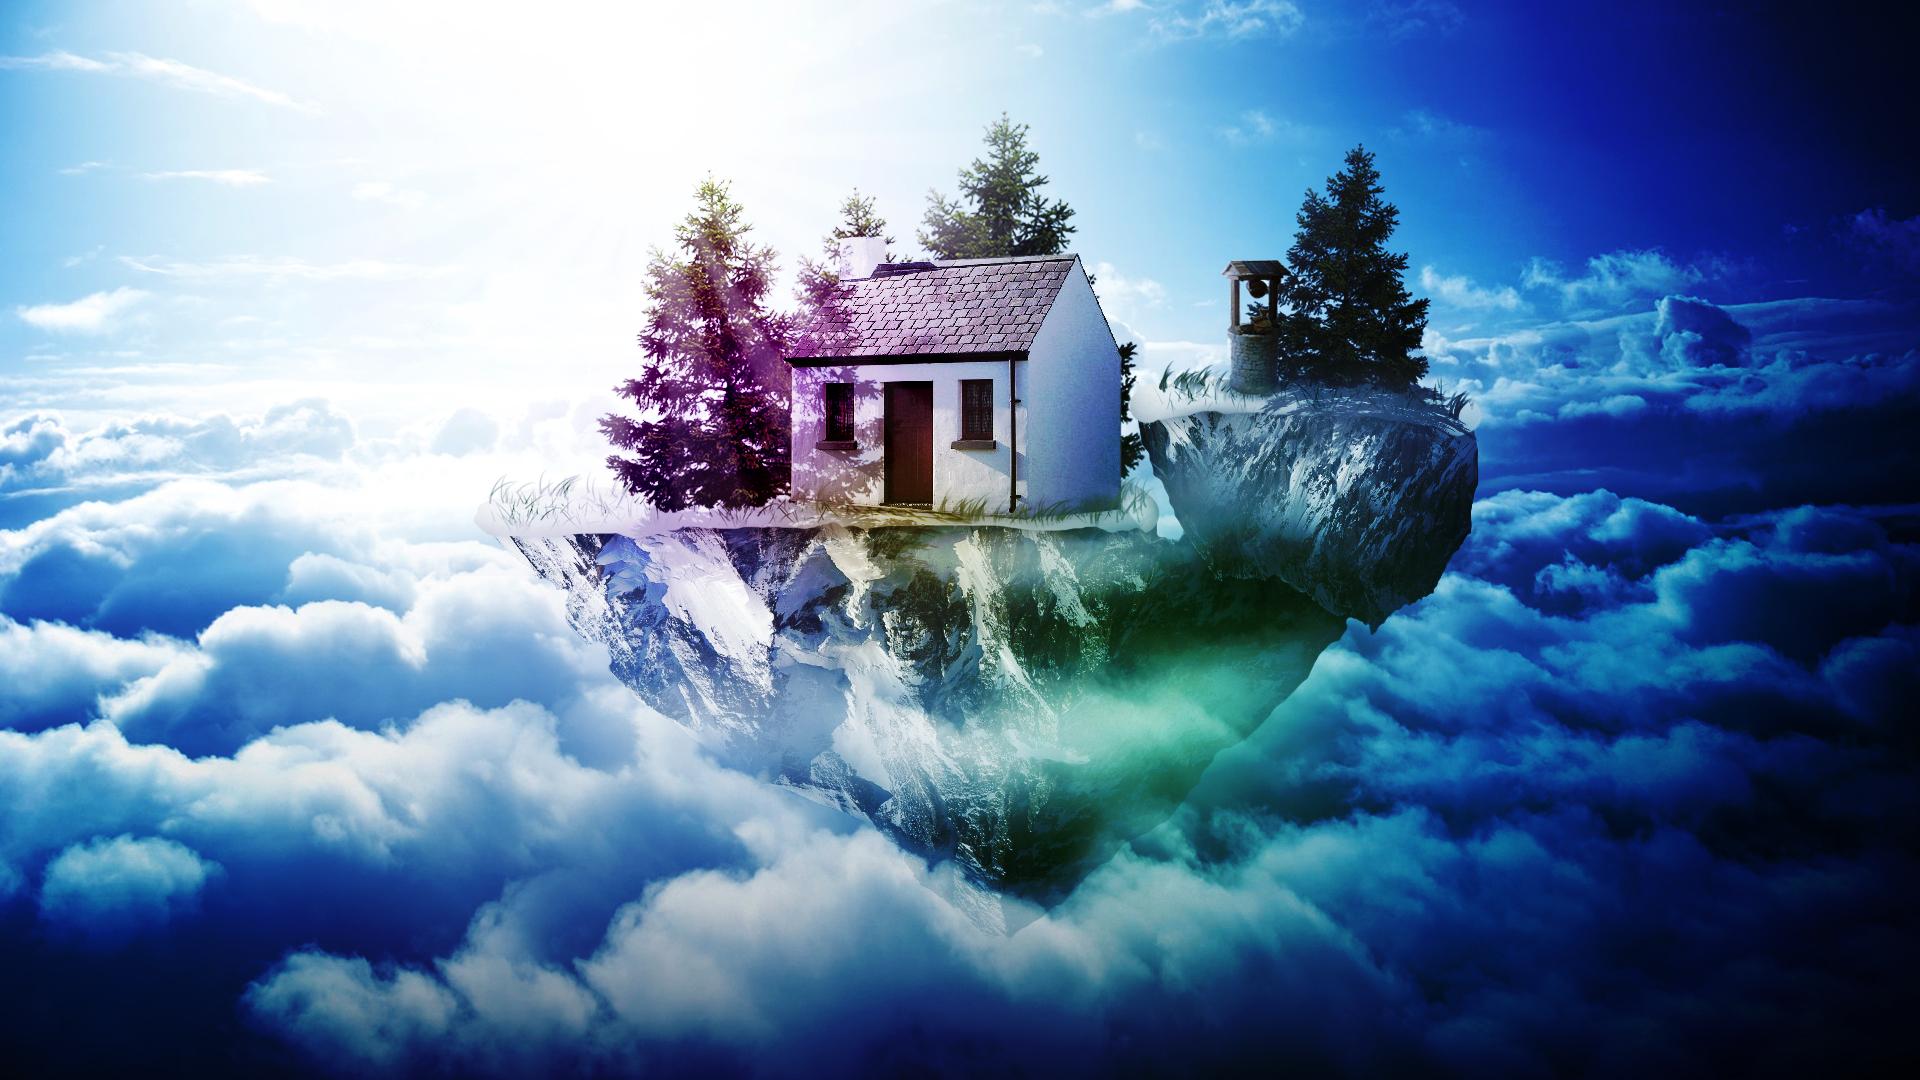 my dream house 4 essay